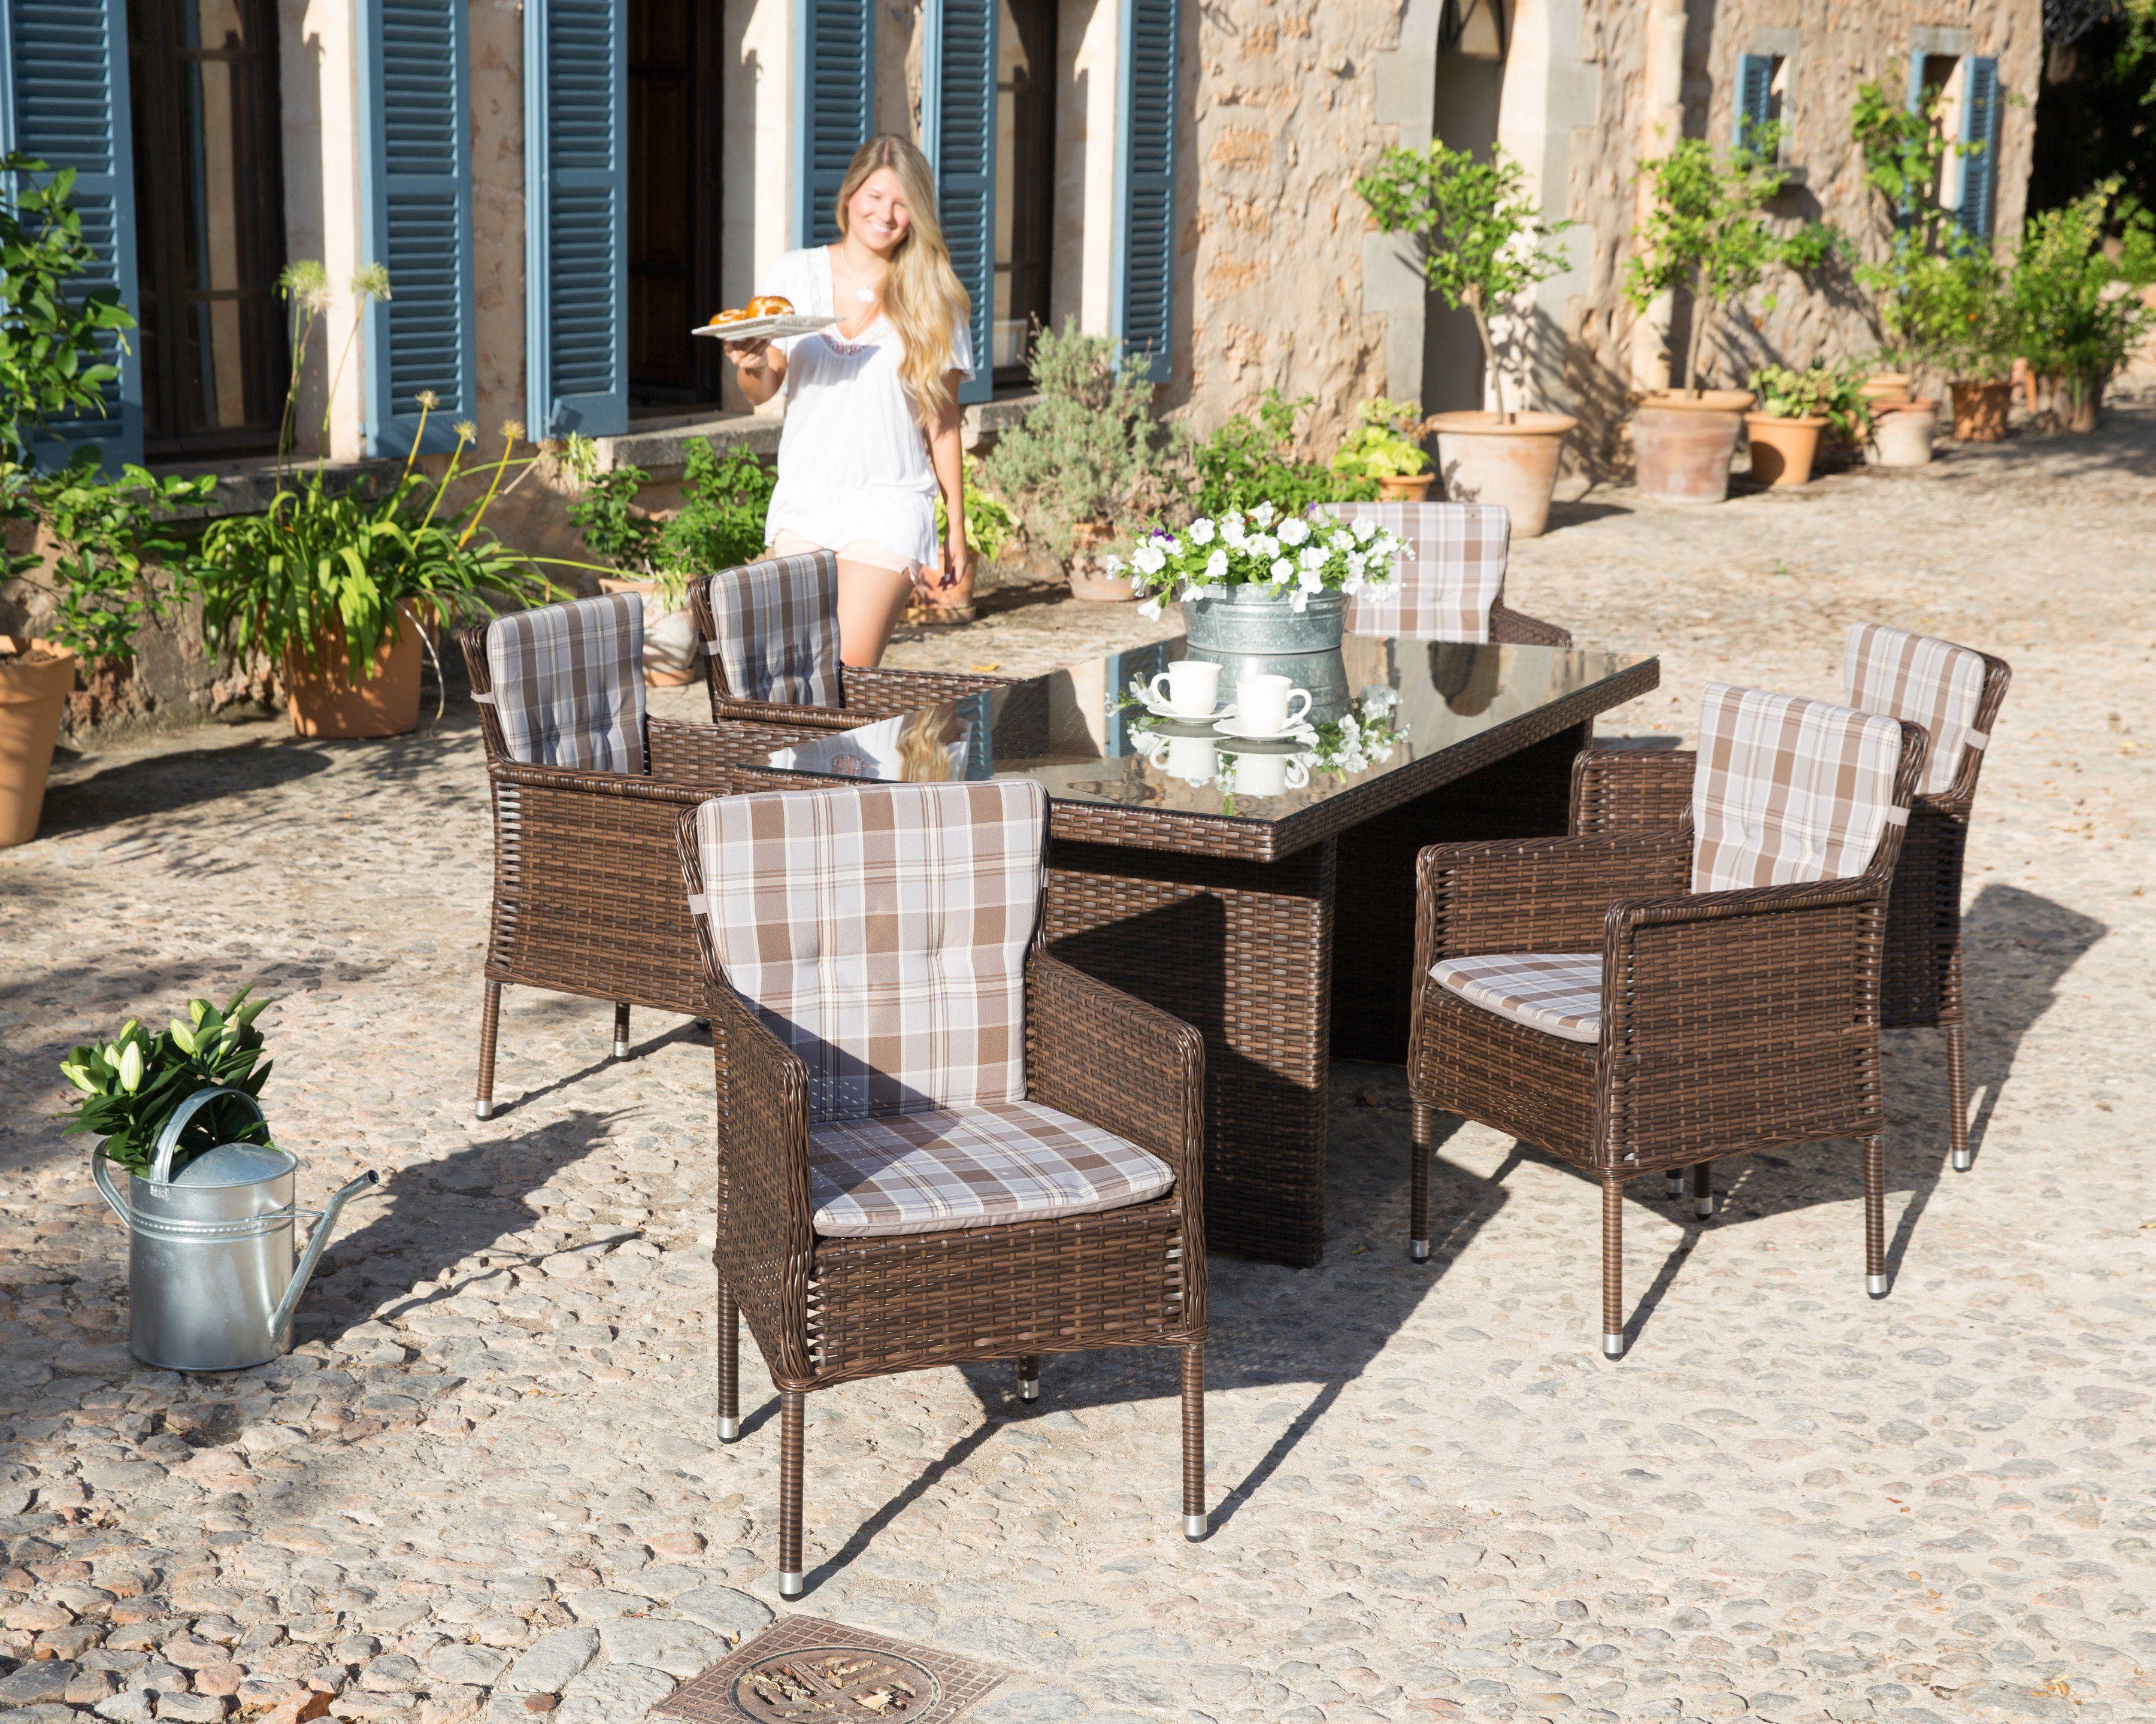 Gartenmöbelset »Malaga«, 6 Sessel, Tisch 180x90 cm, Polyrattan, braun